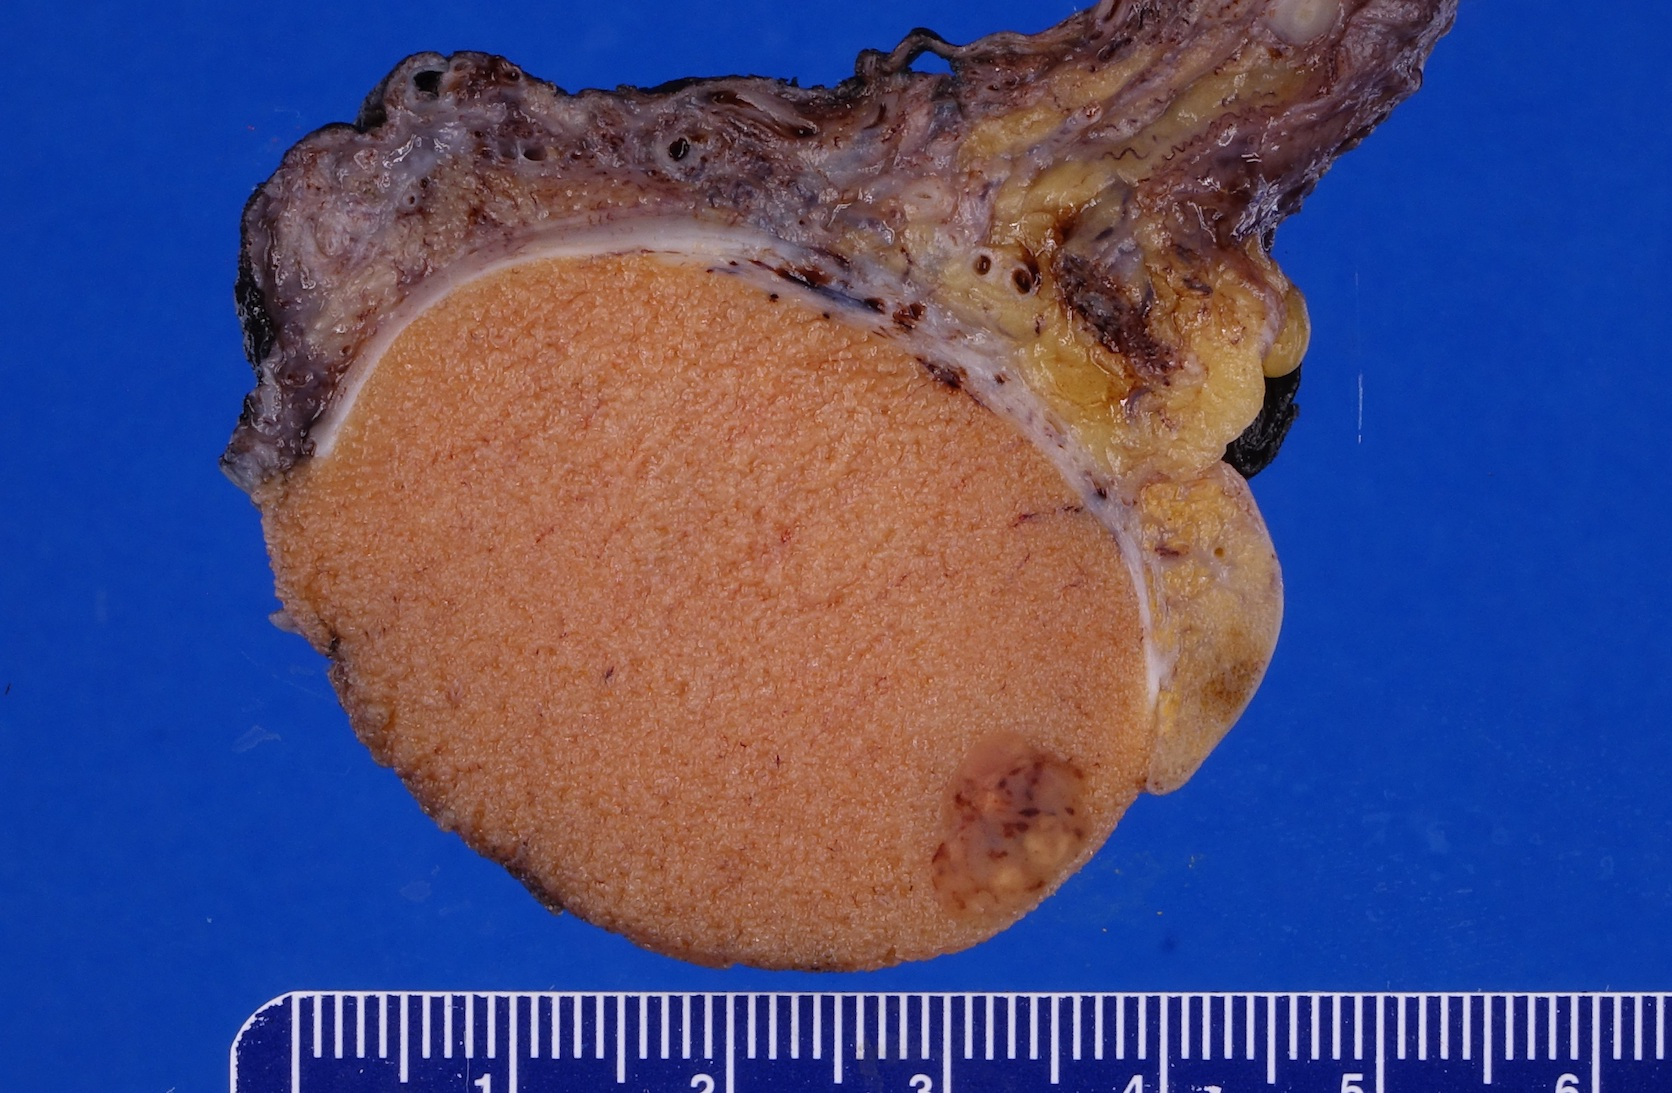 Small tumor